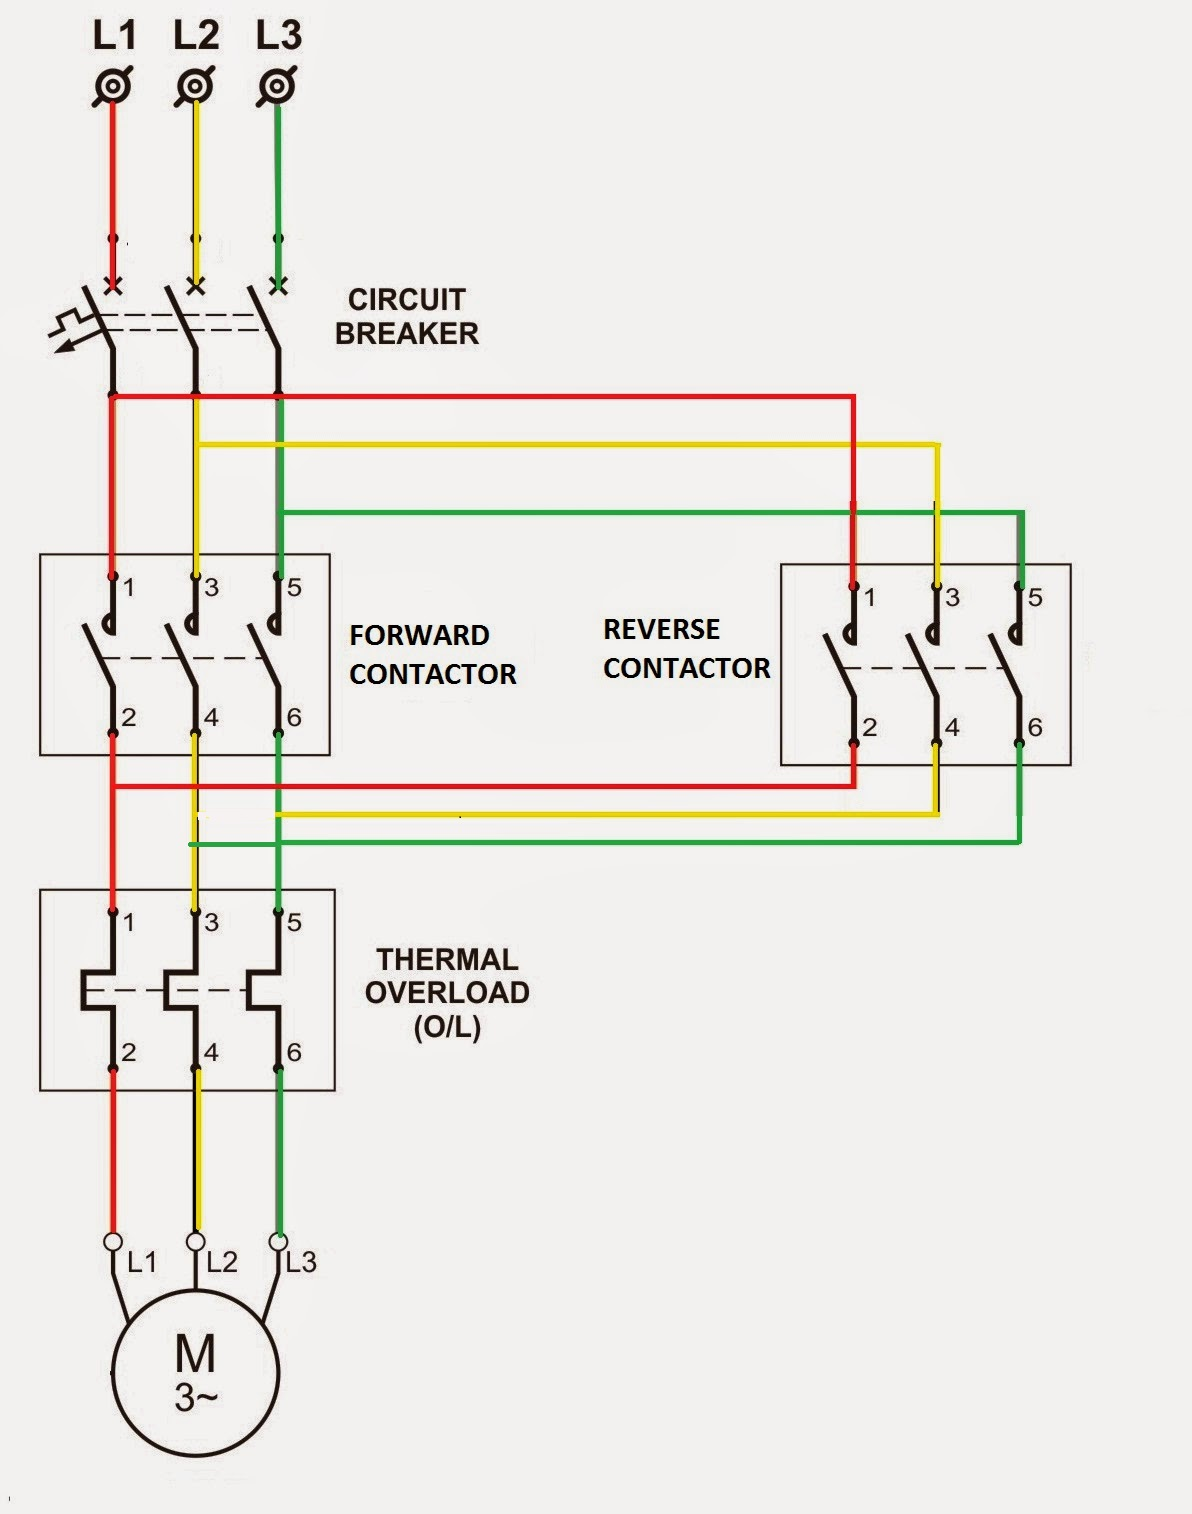 reversing contactor wiring wiring diagram used reversing motor starter wiring diagram motor reversing contactor wiring diagram [ 1192 x 1514 Pixel ]